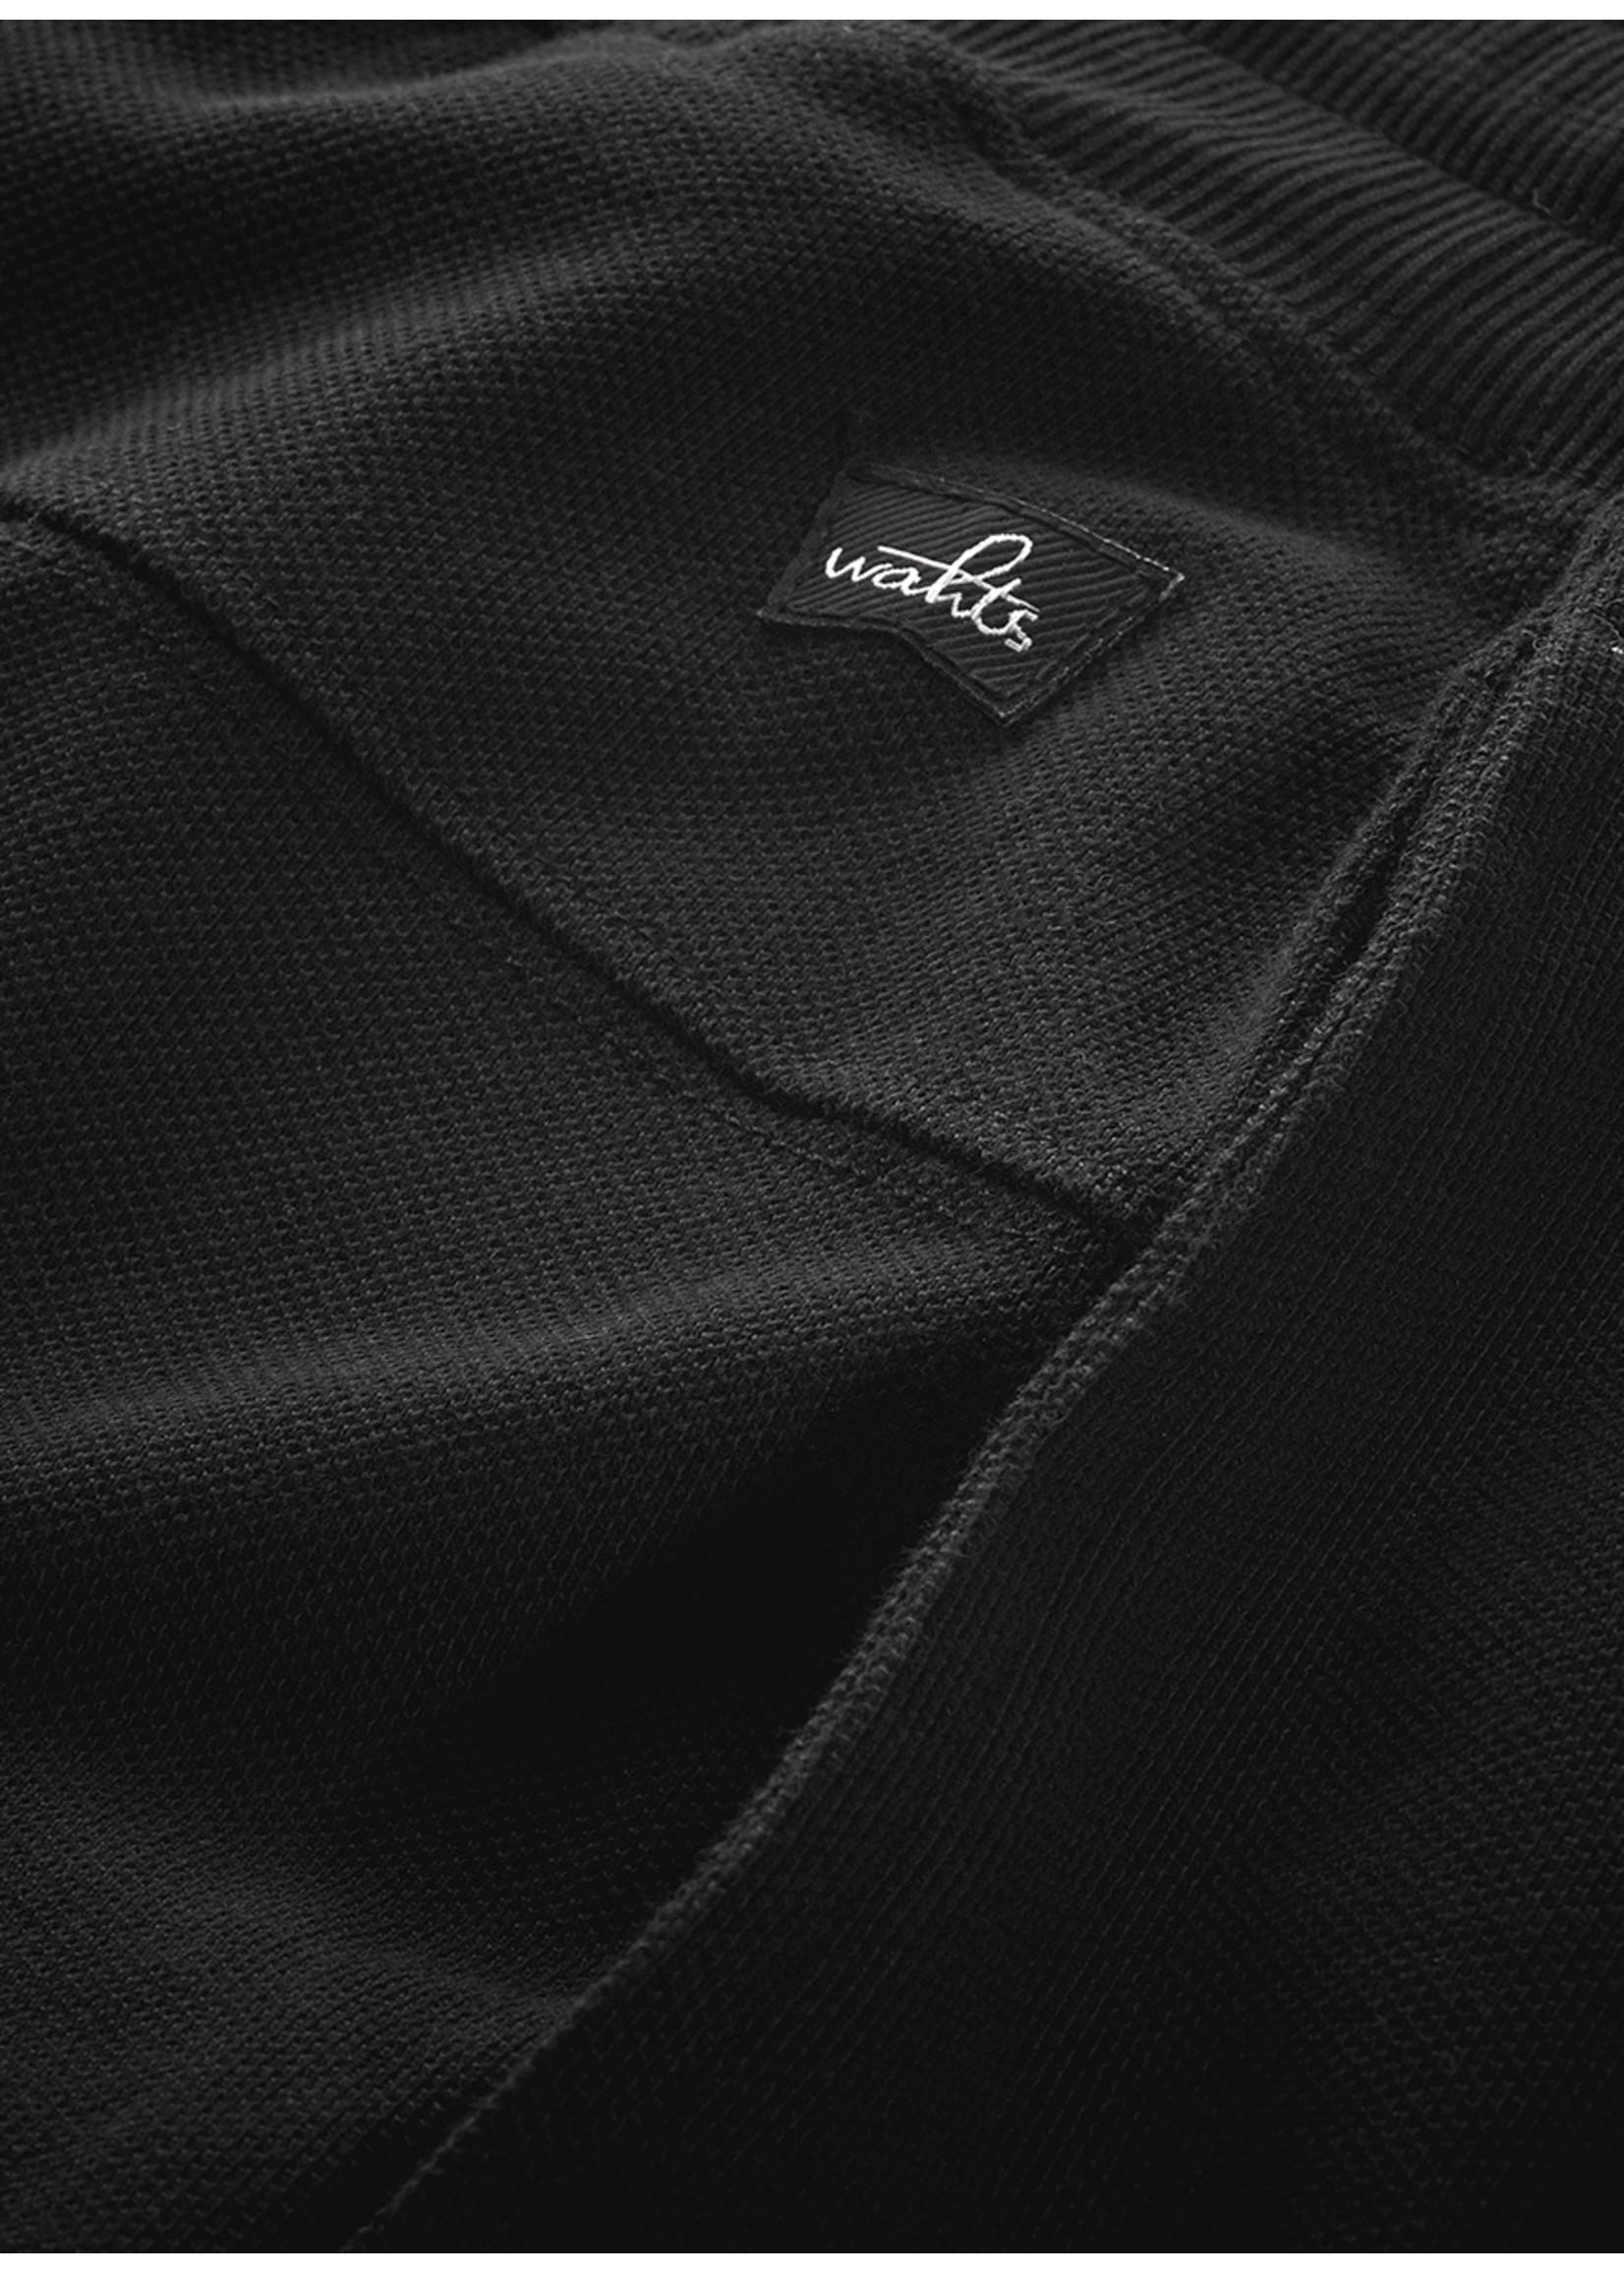 Wahts Key pique shorts pure black